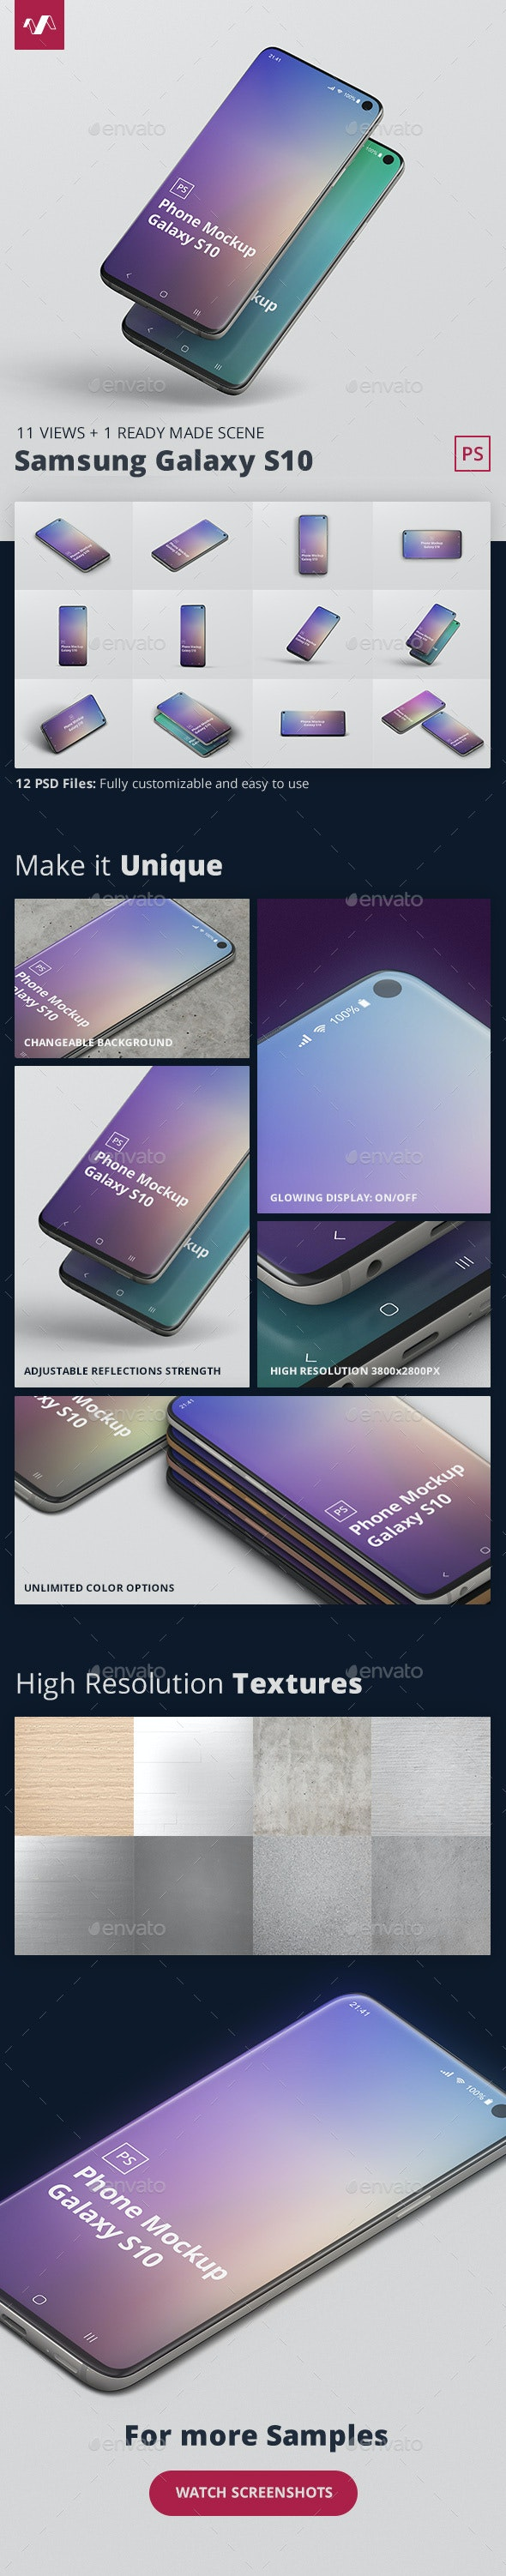 Phone Mockup Galaxy S10 - Mobile Displays